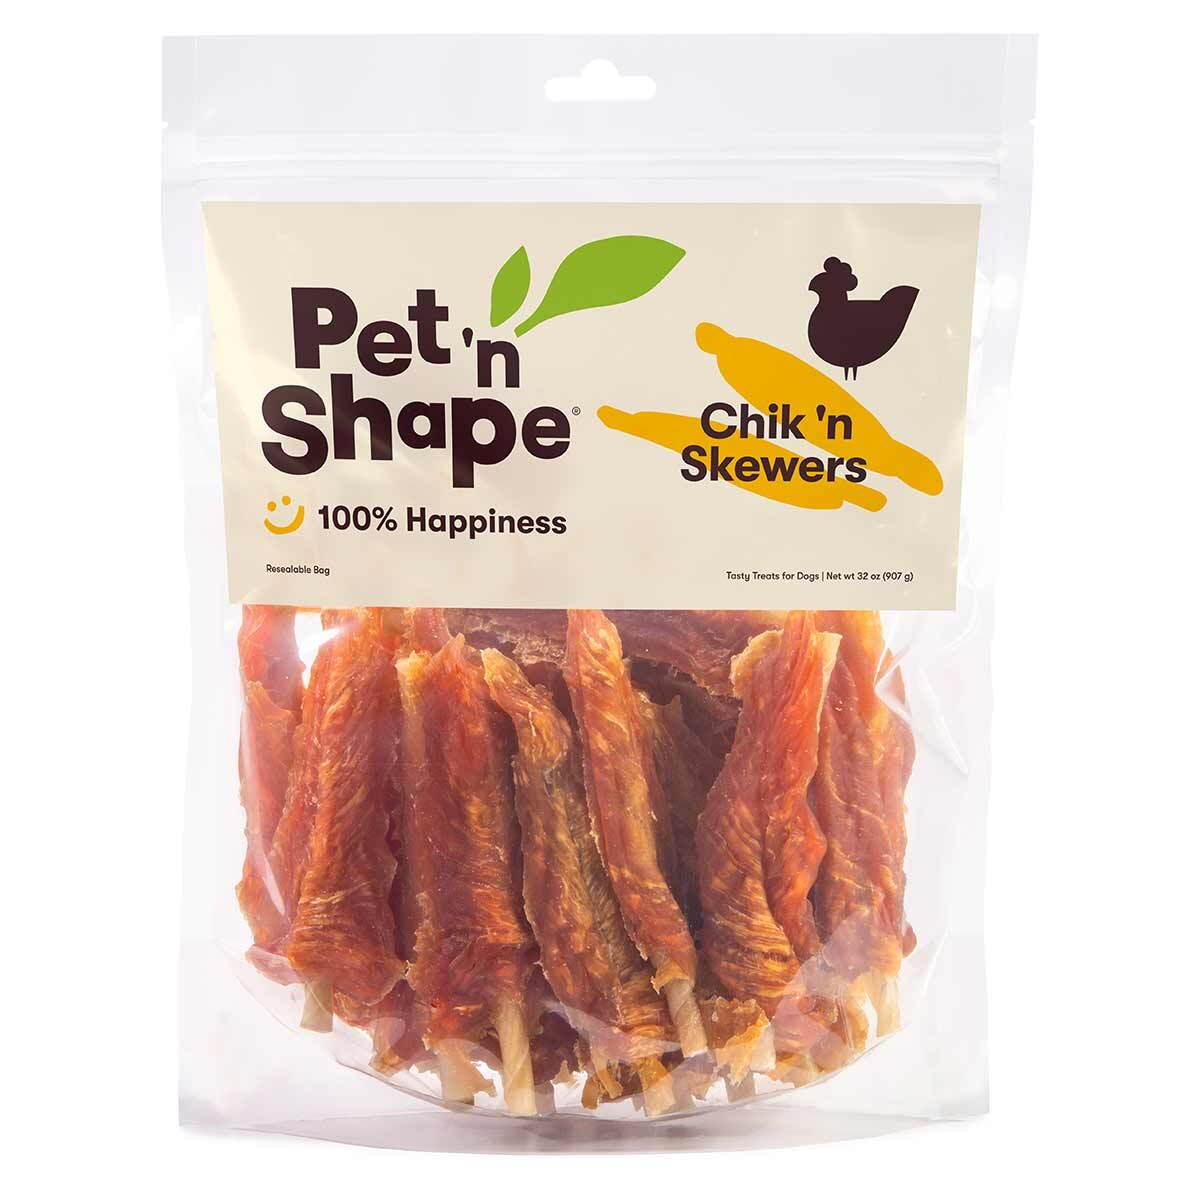 Pet 'n Shape chicken Skewer Dog Treats 32 oz